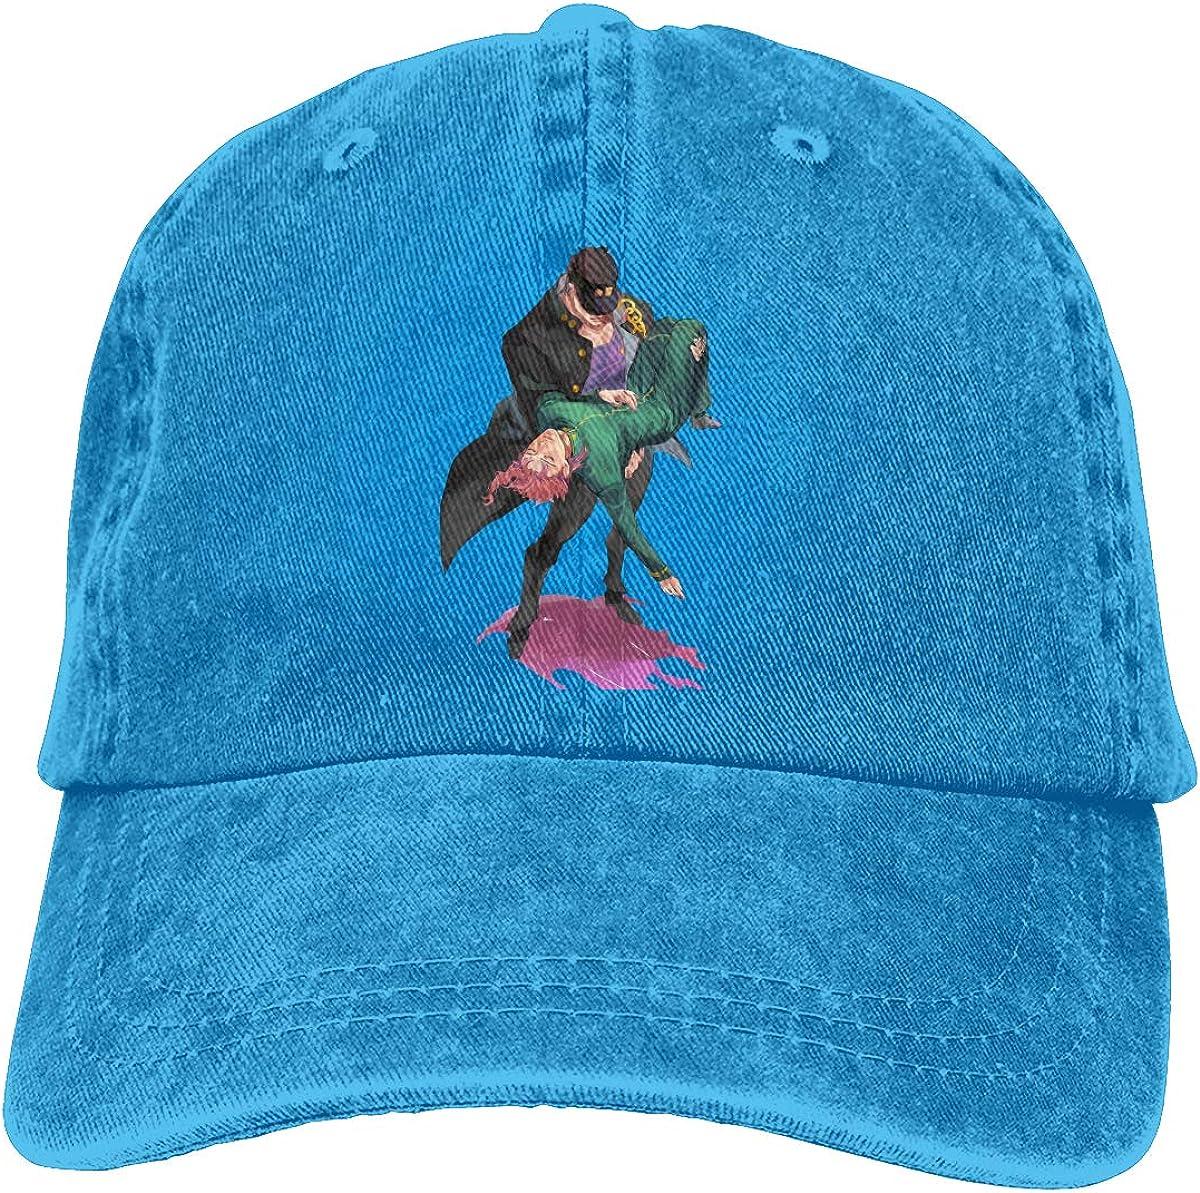 Govt Mule Unisex Popular Casquette Hat Vintage Adjustable Music Band Baseball Caps Black